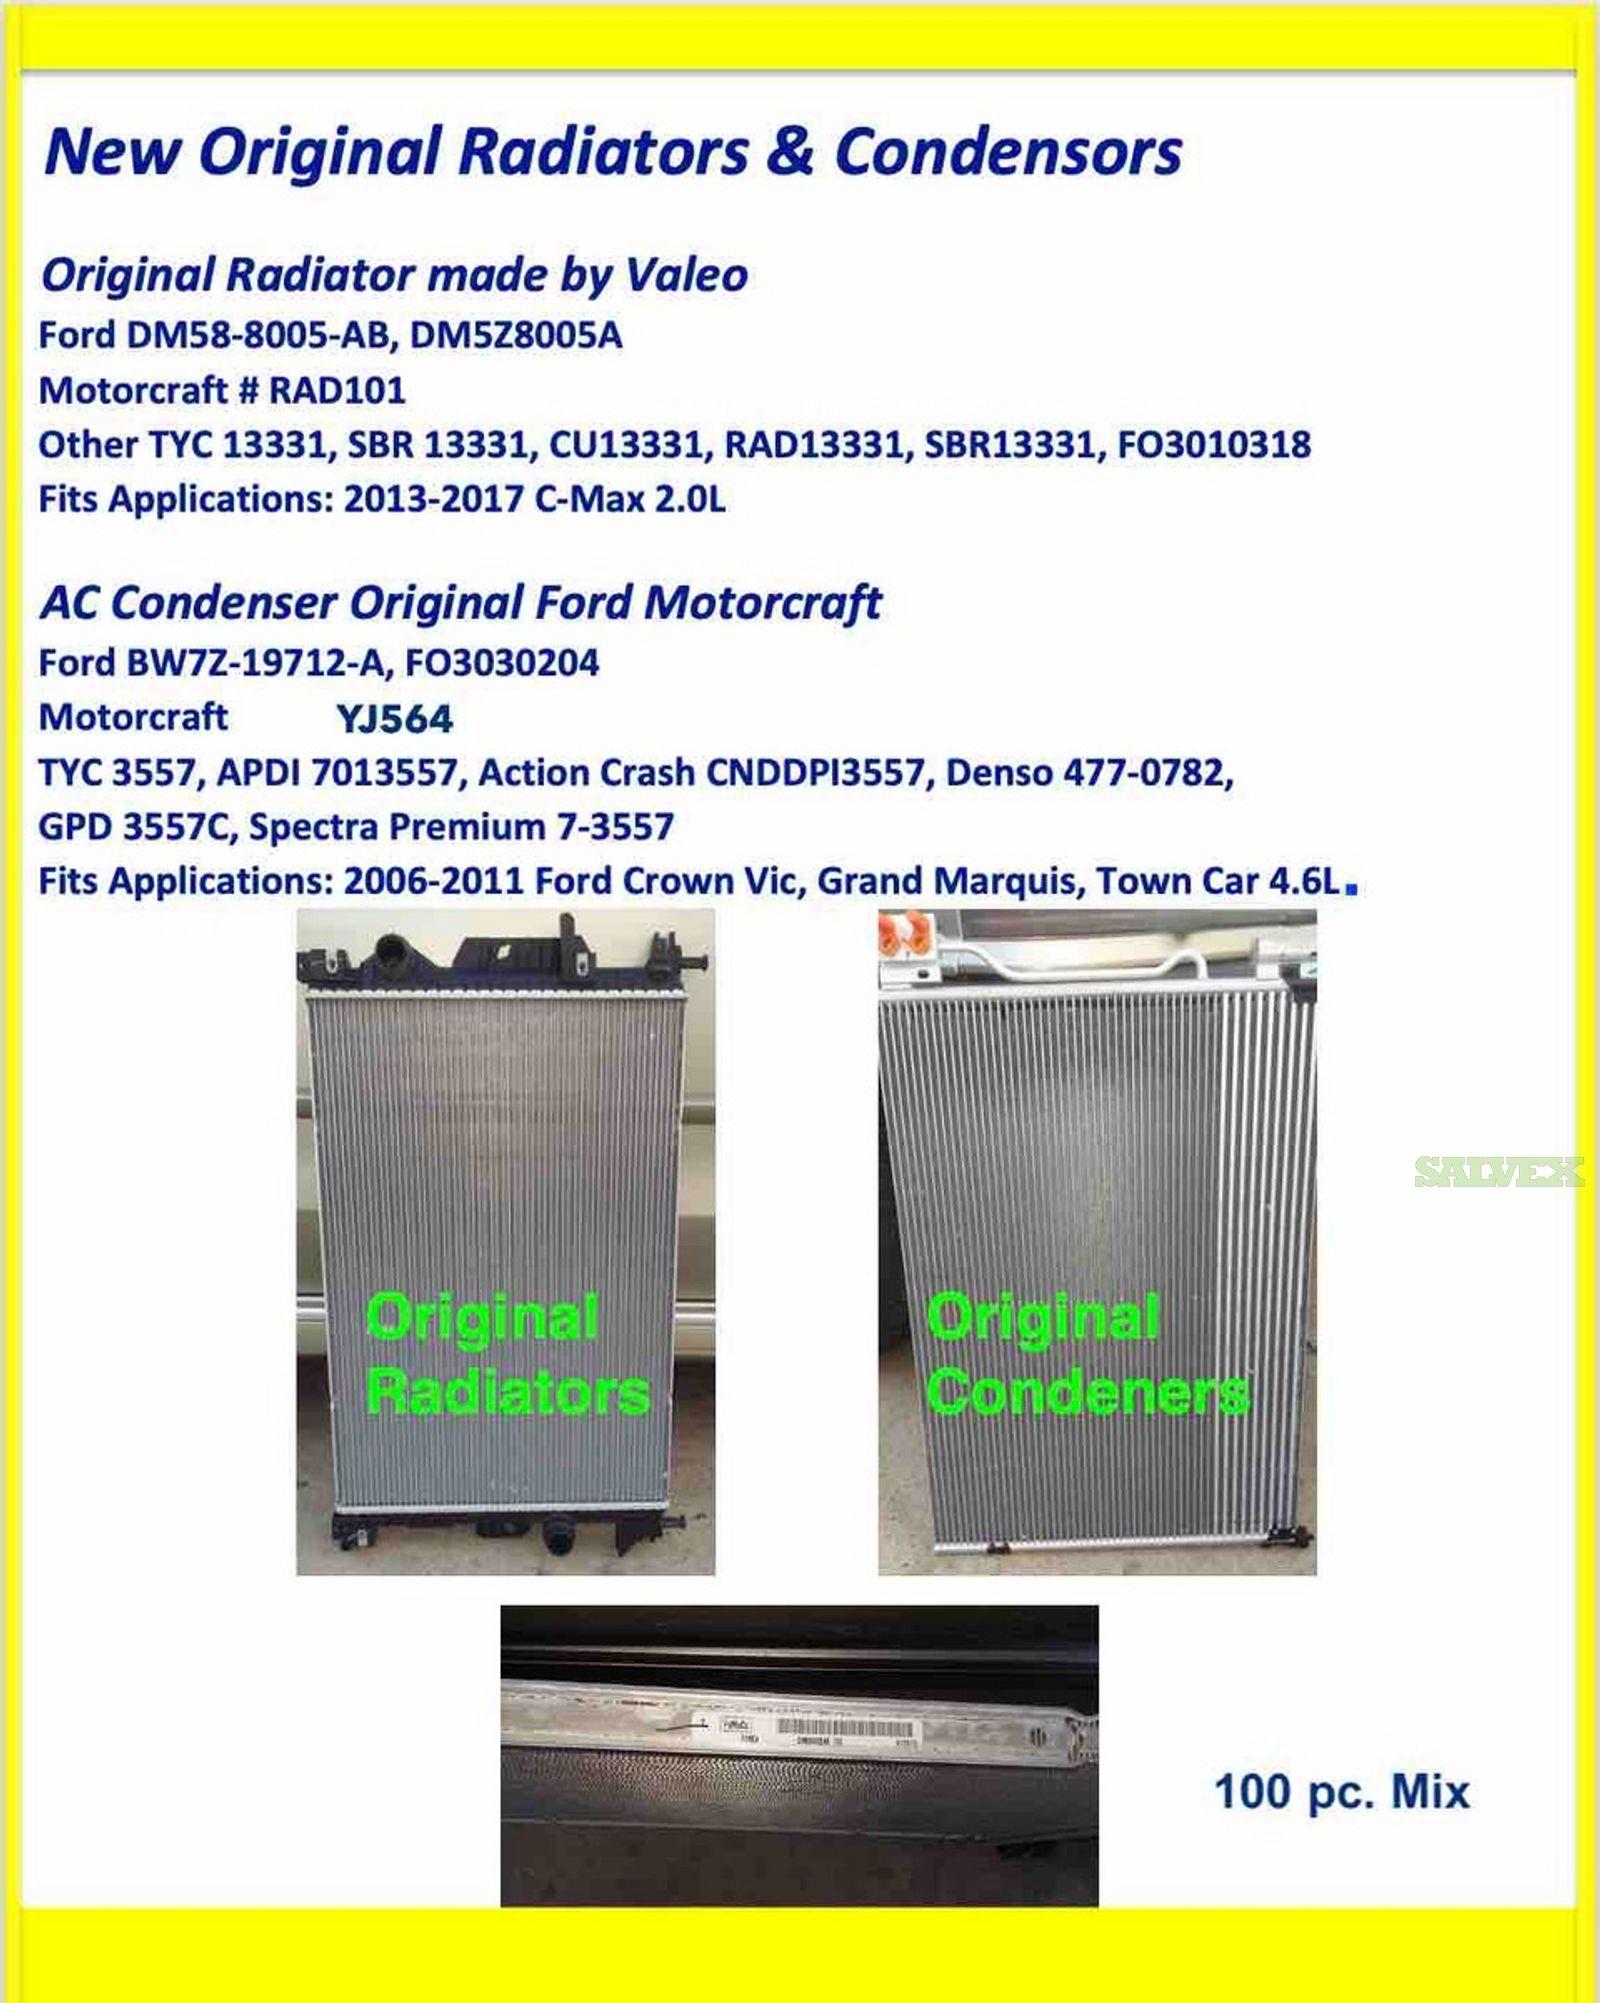 Valeo Radiators & Original Ford Motorcraft Condensers (100 Pcs)